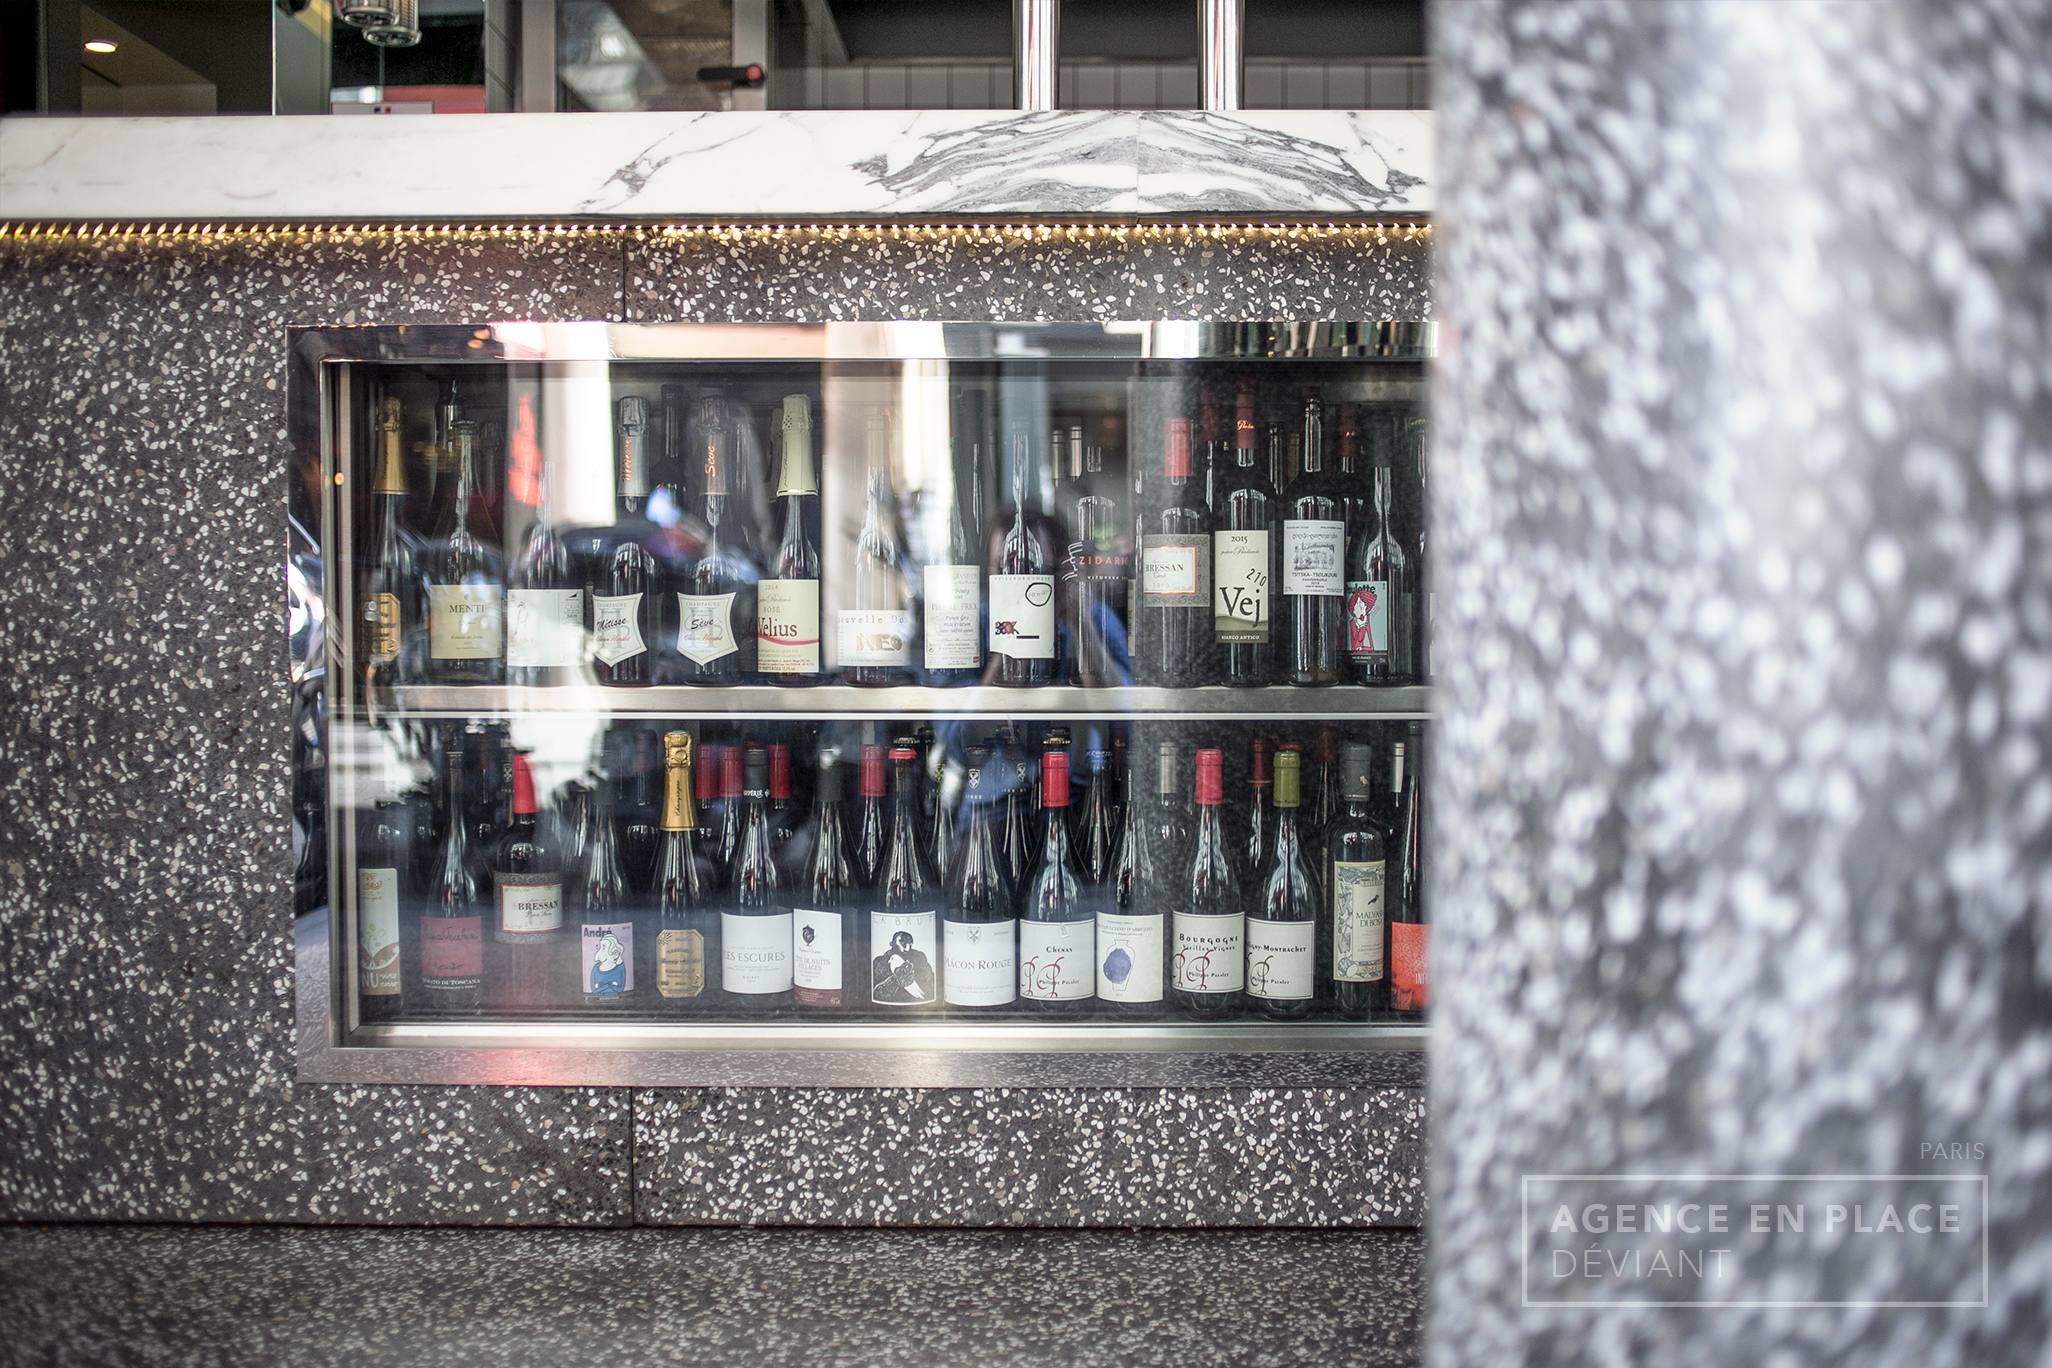 deviant-agenceenplace-winebar-002